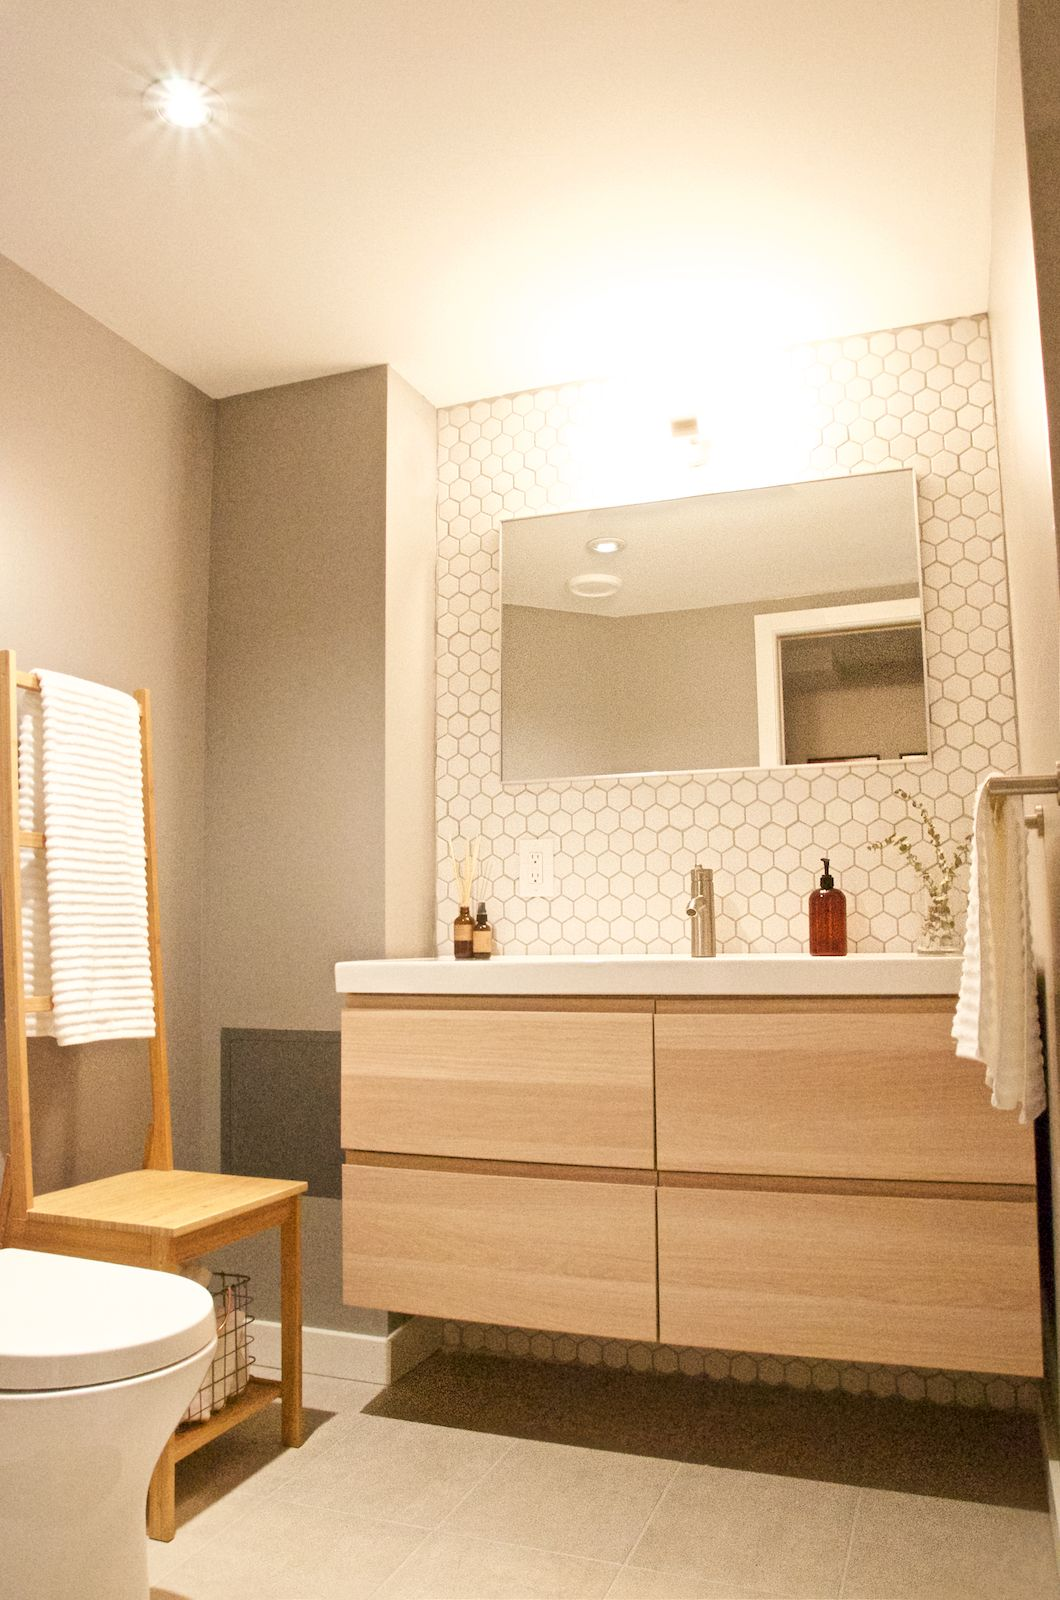 Etonnant Basement Guest Bathroom. IKEA Godmorgon Cabinet. Mirror From CB2. White  Matte Hexagon Tile Backsplash. Tags: Mcm, Mid Century Modern Bathroom